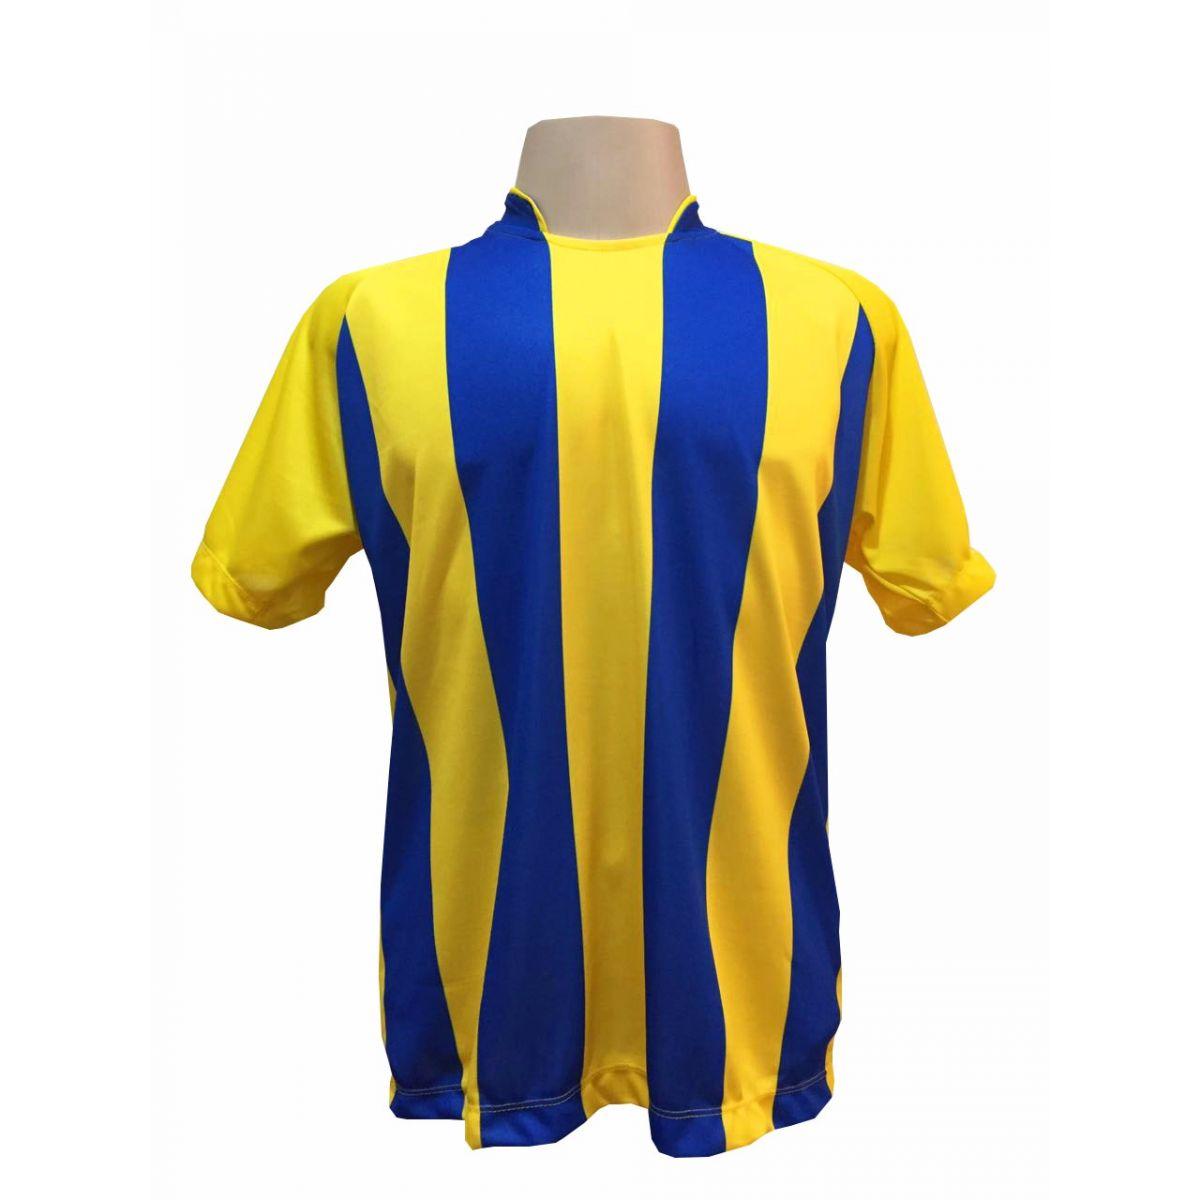 Fardamento Completo modelo Milan 18+1 (18 Camisas Amarelo/Royal + 18 Calções Amarelo/Royal + 18 Pares de Meiões Royal + 1 Conjunto de Goleiro) + Brindes